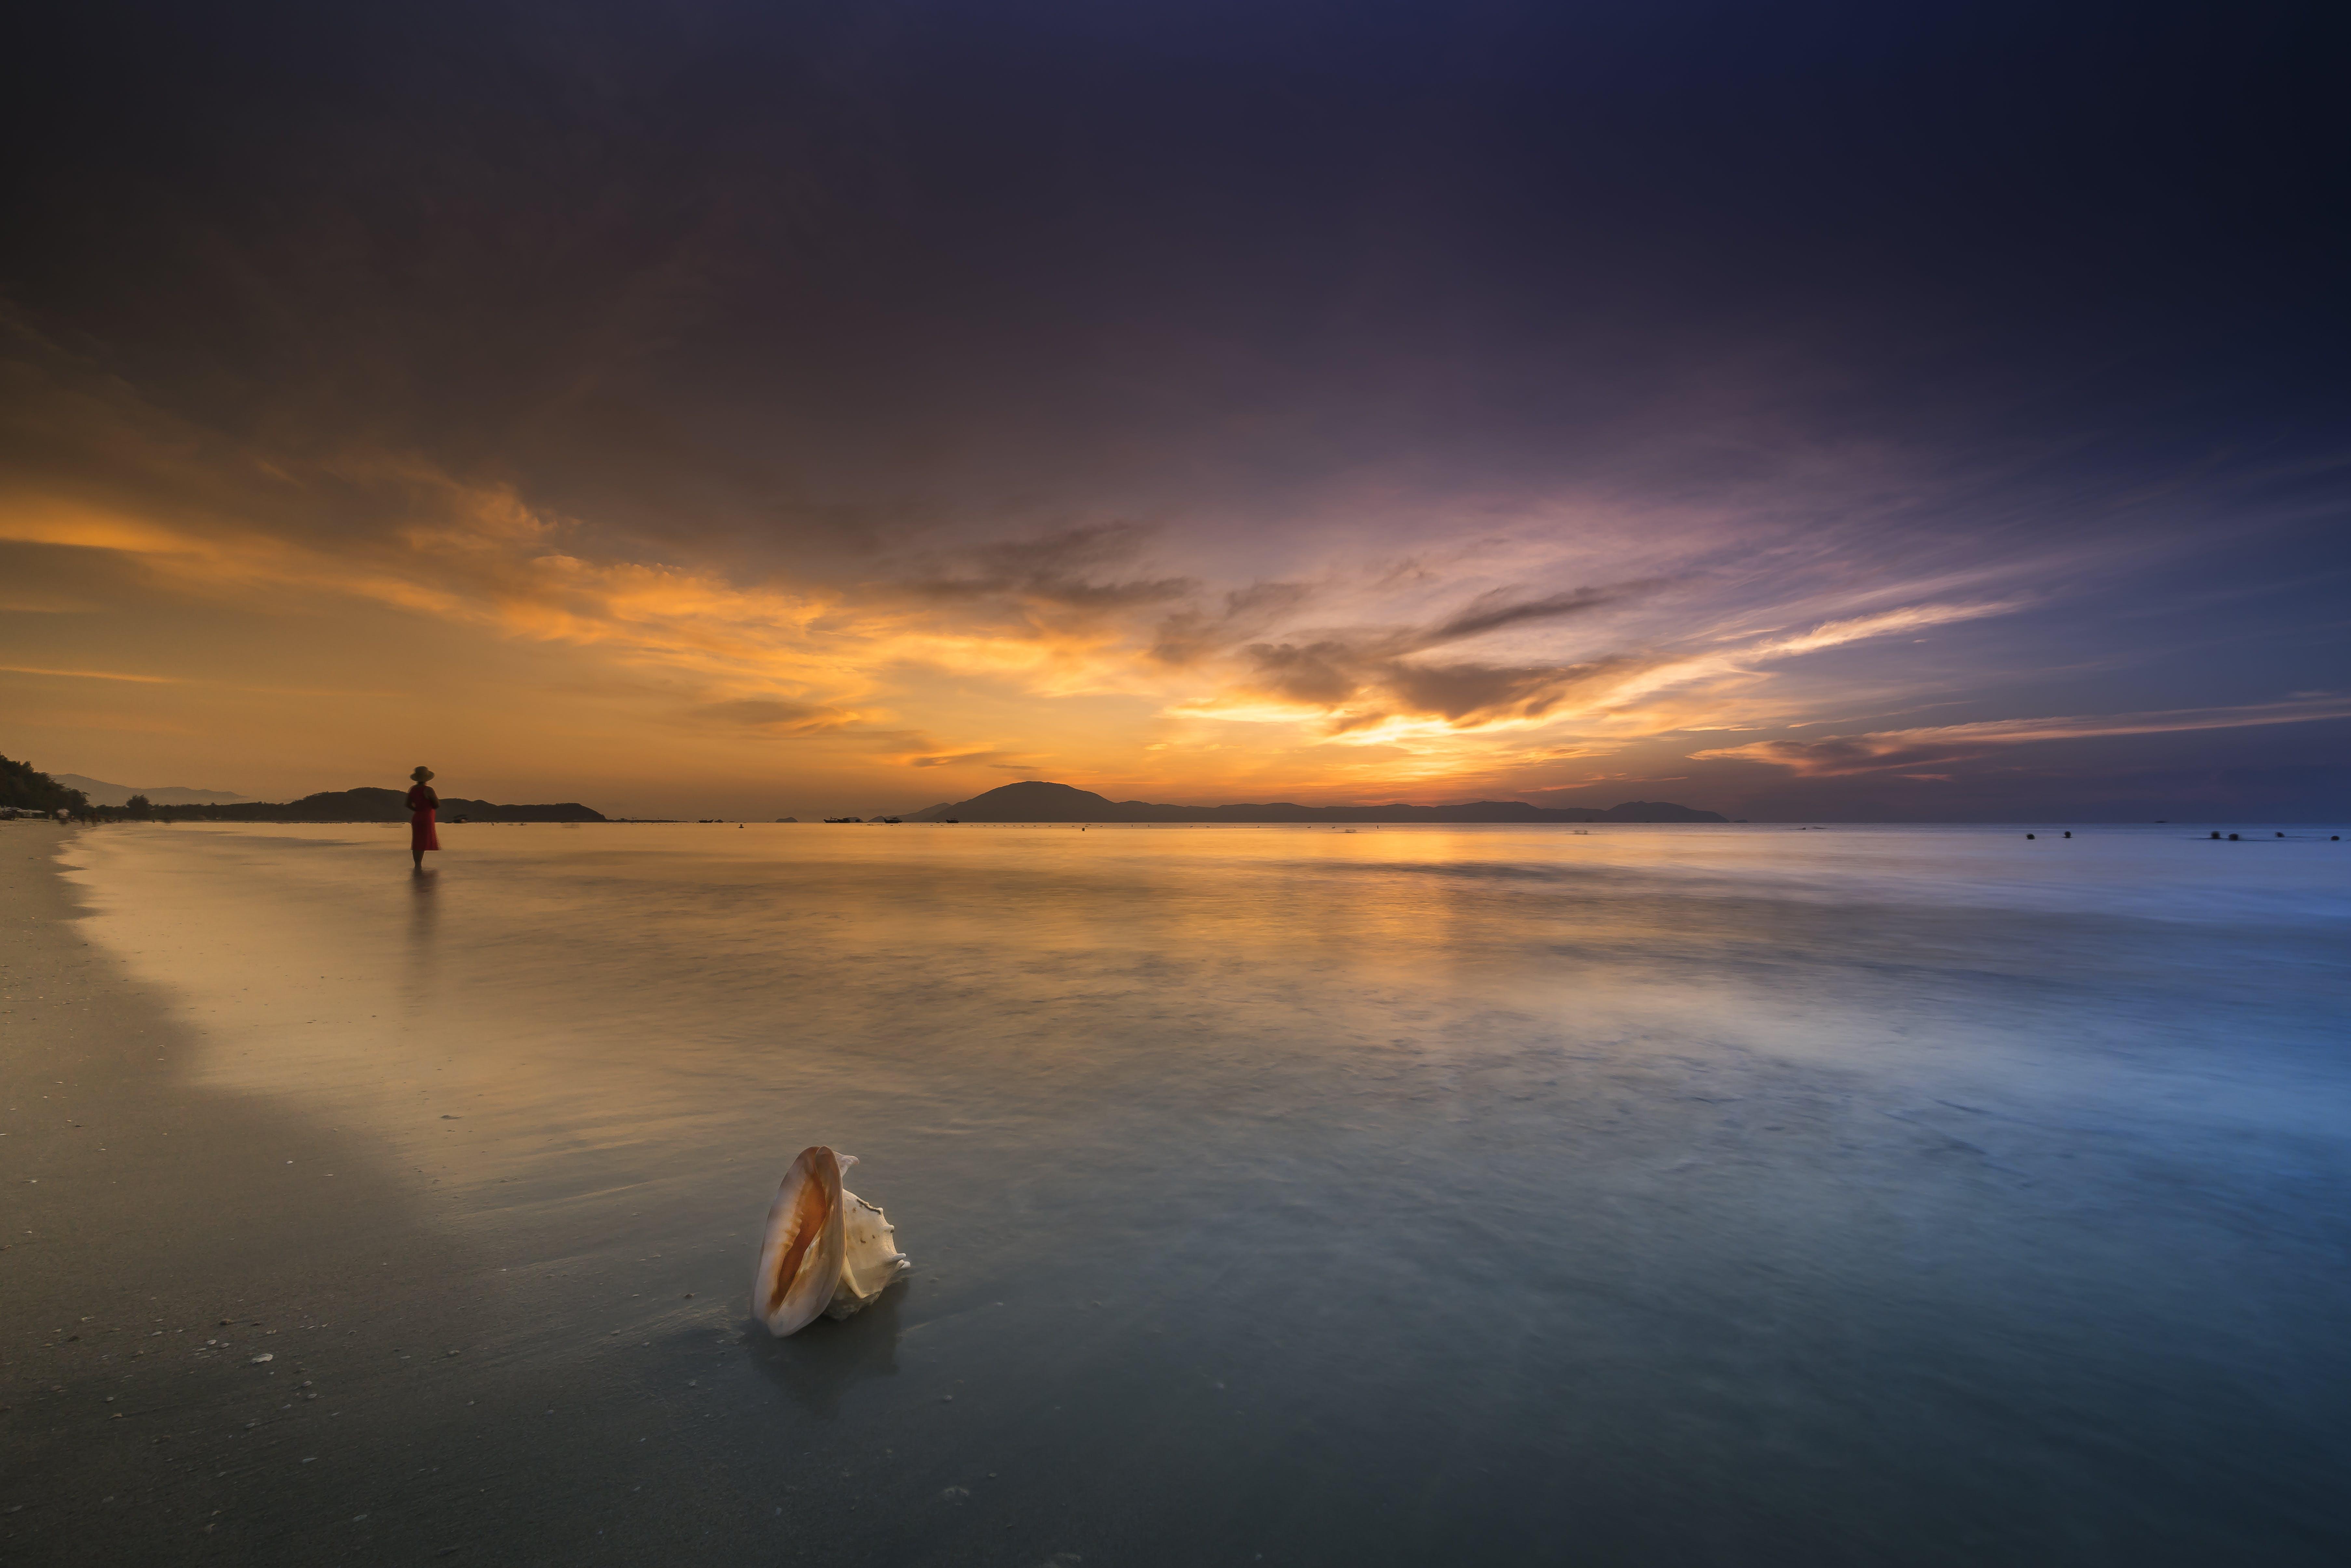 Бесплатное стоковое фото с waingani, берег, восход, закат